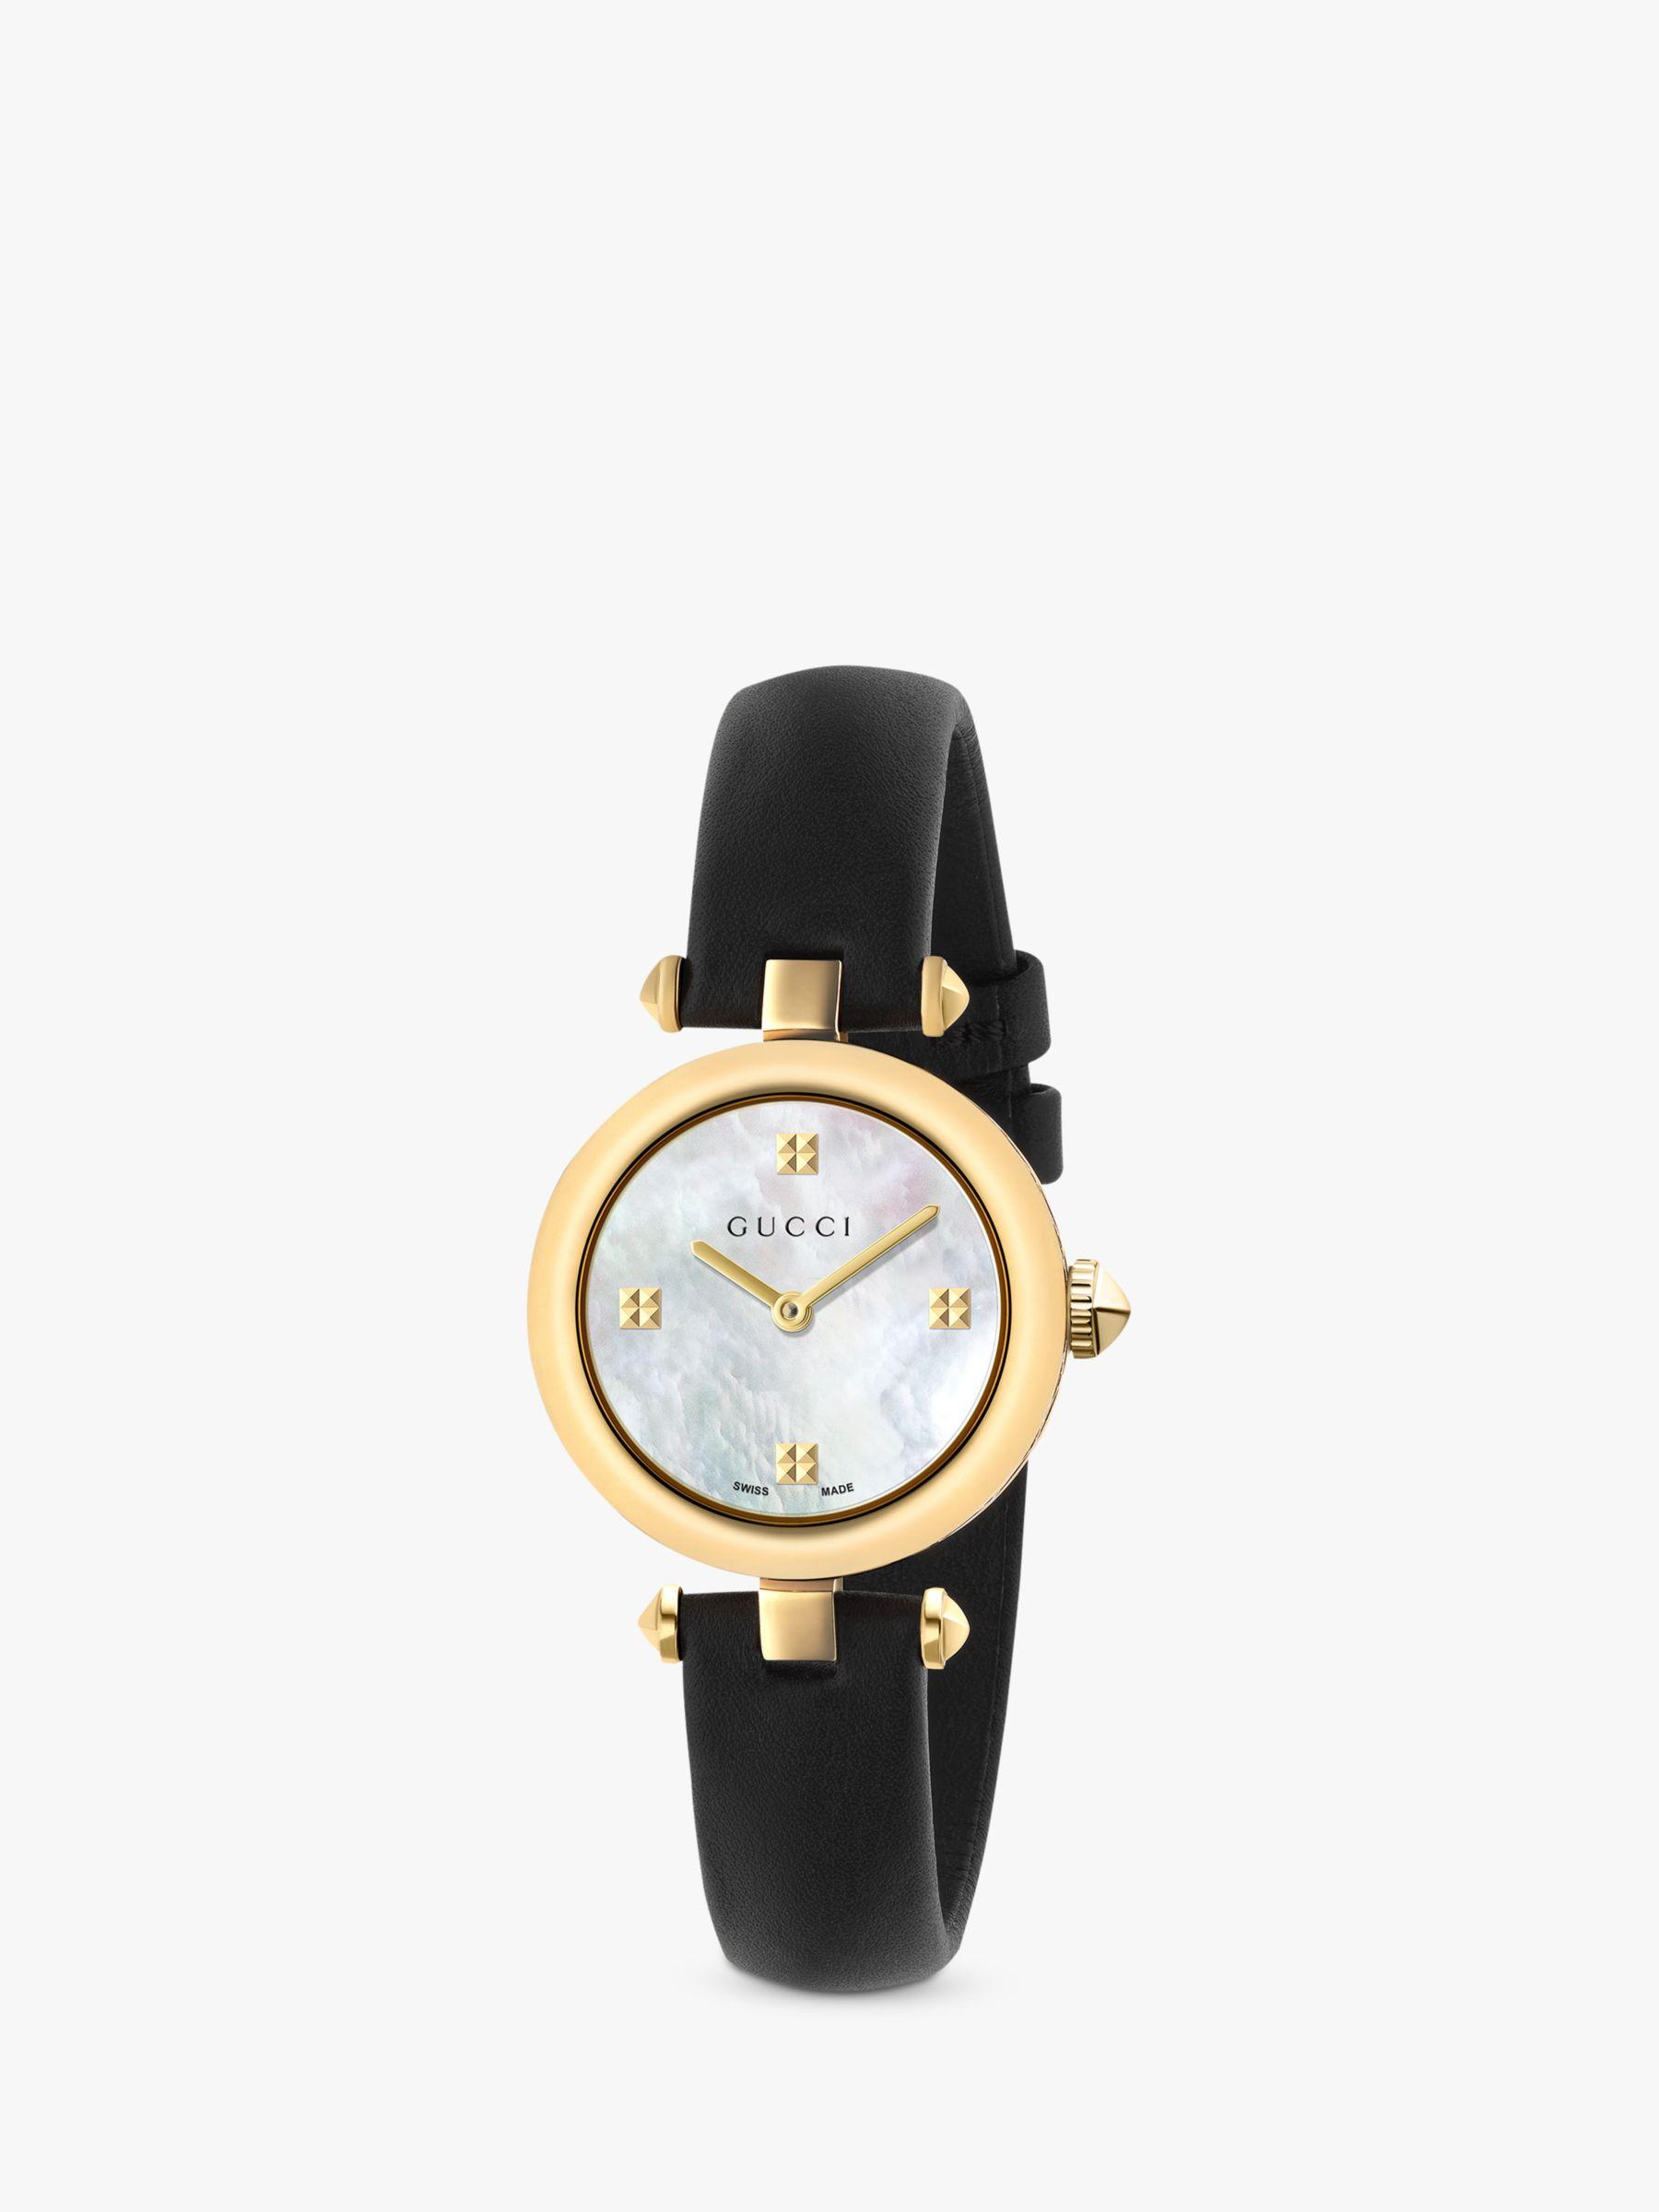 Gucci Gucci YA141505 Women's Diamantissima Leather Strap Watch, Black/White